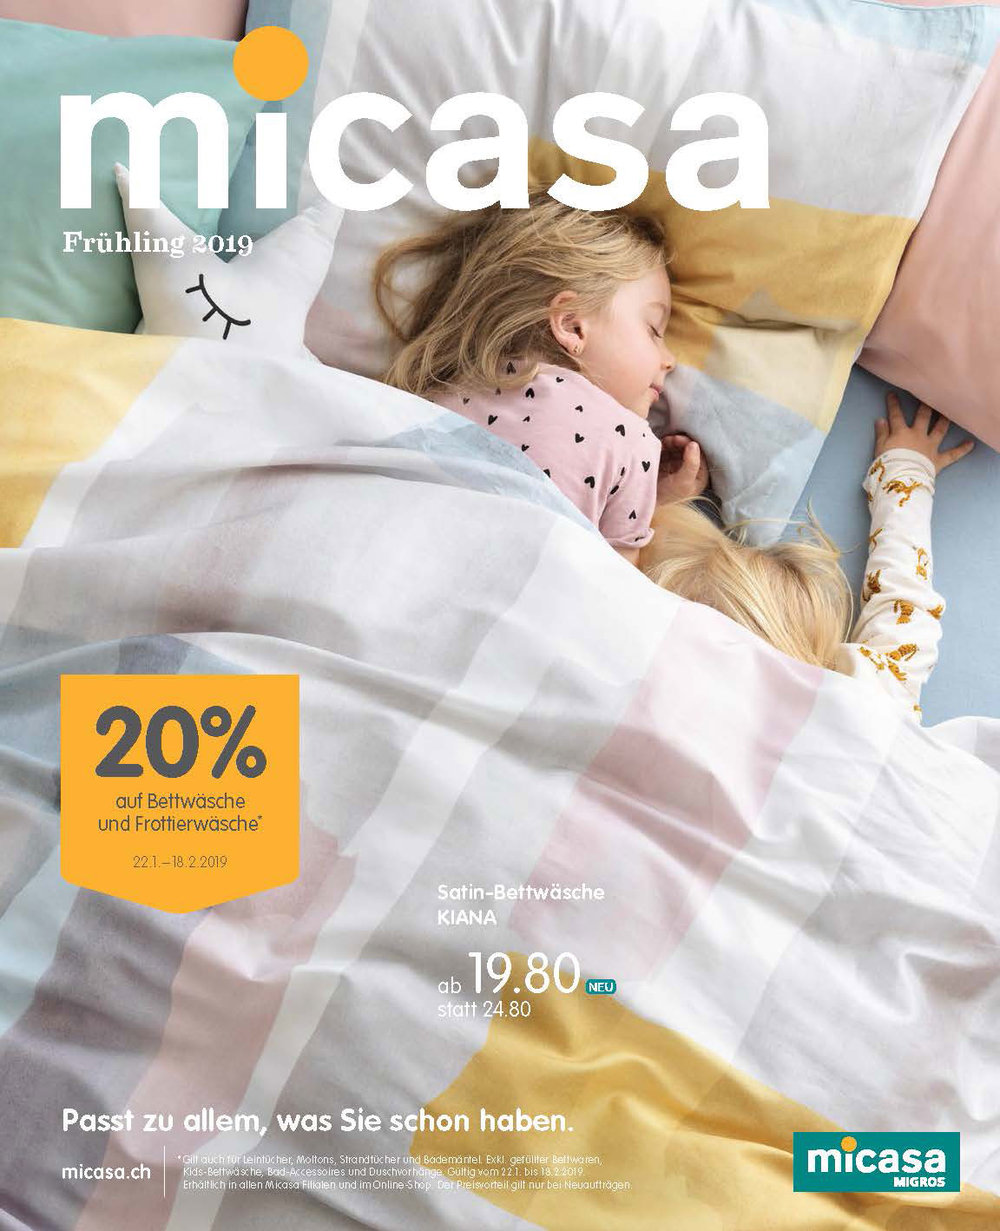 2019-02-12_Joyce-McInnis_Micasa-Spring19-01.jpg